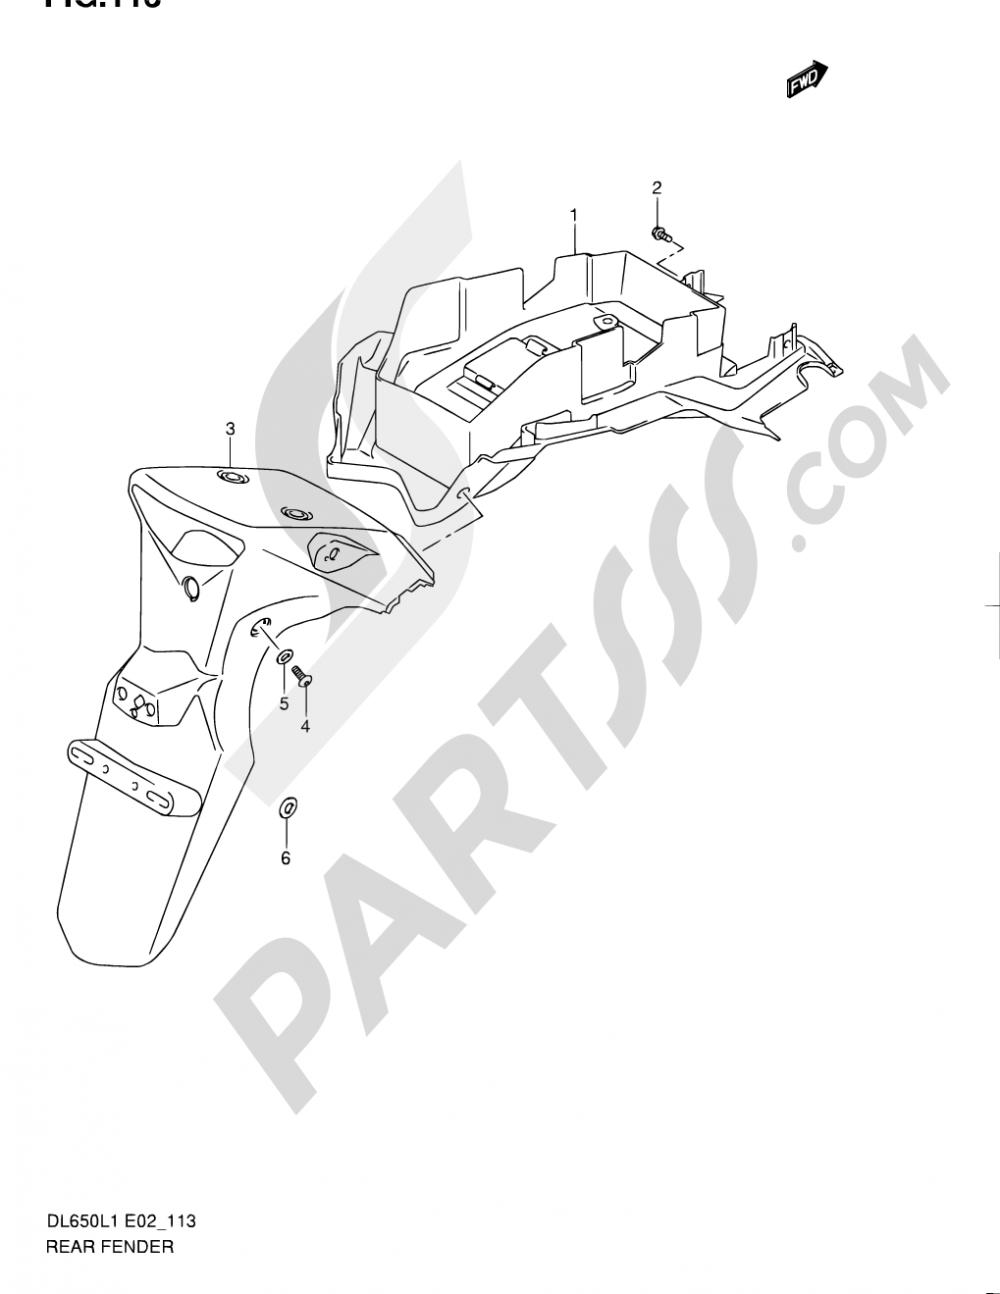 113 - REAR FENDER (DL650AL1 E19) Suzuki VSTROM DL650A 2011